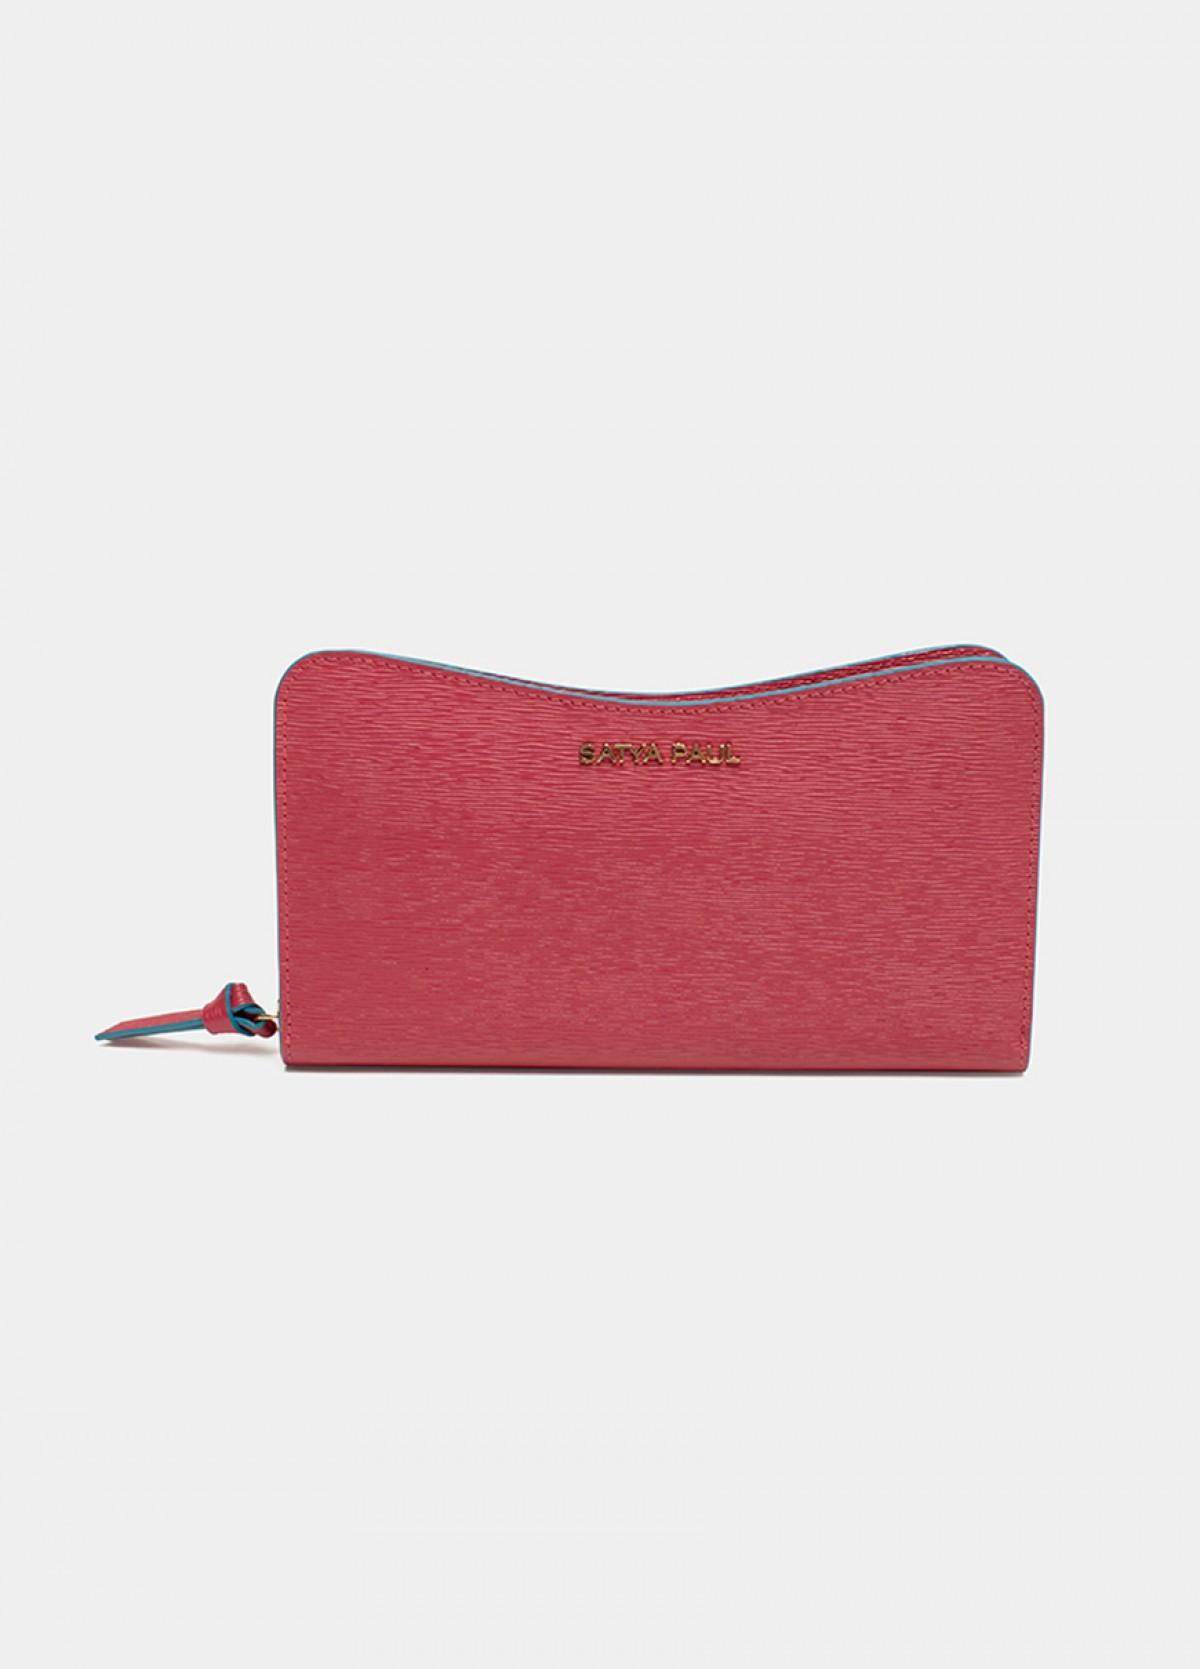 The Nanda Wallet